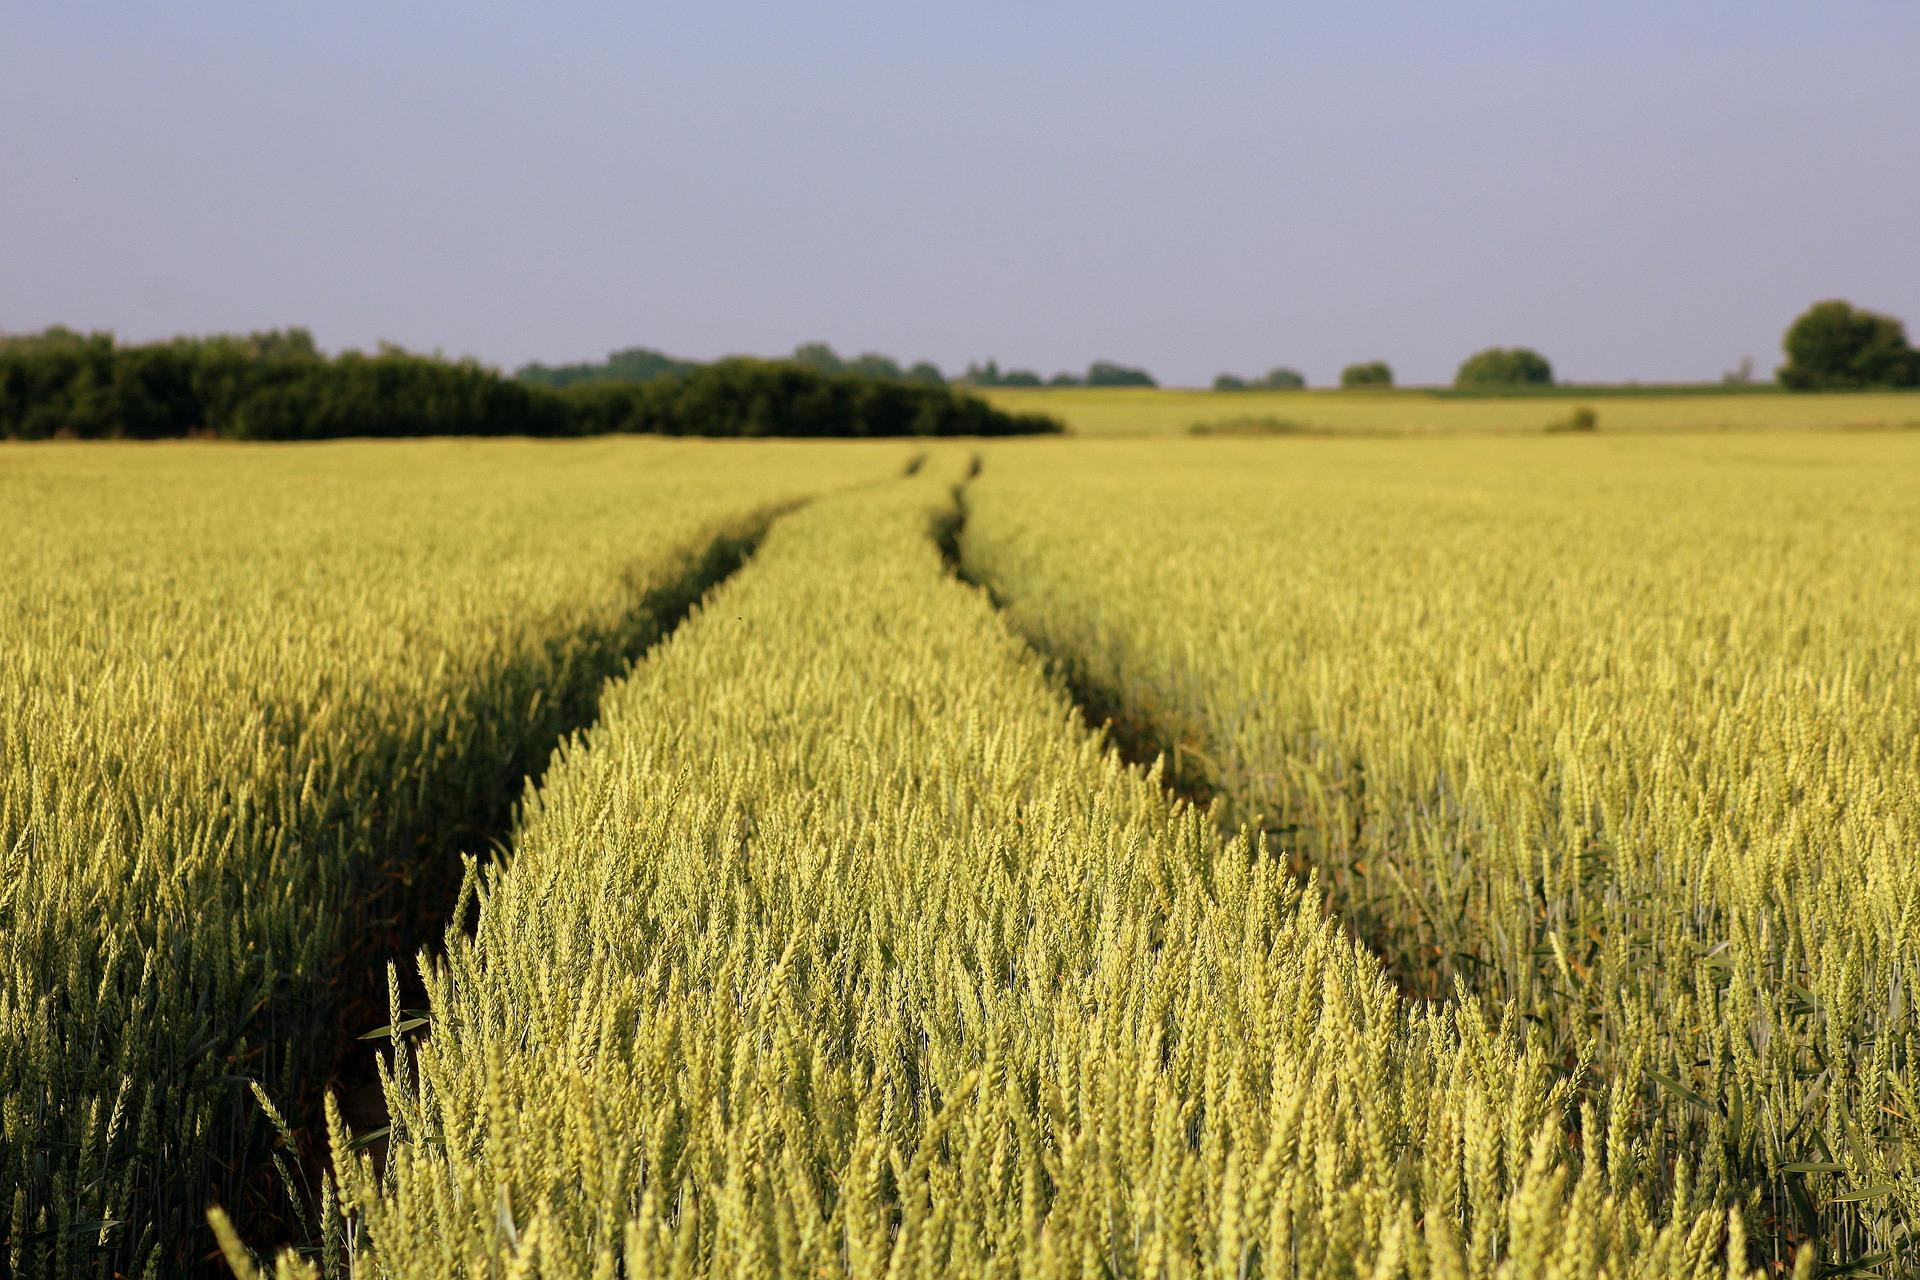 Держгеокадастр передасть ОТГ 2 млн гектарів земель сільгосппризначення